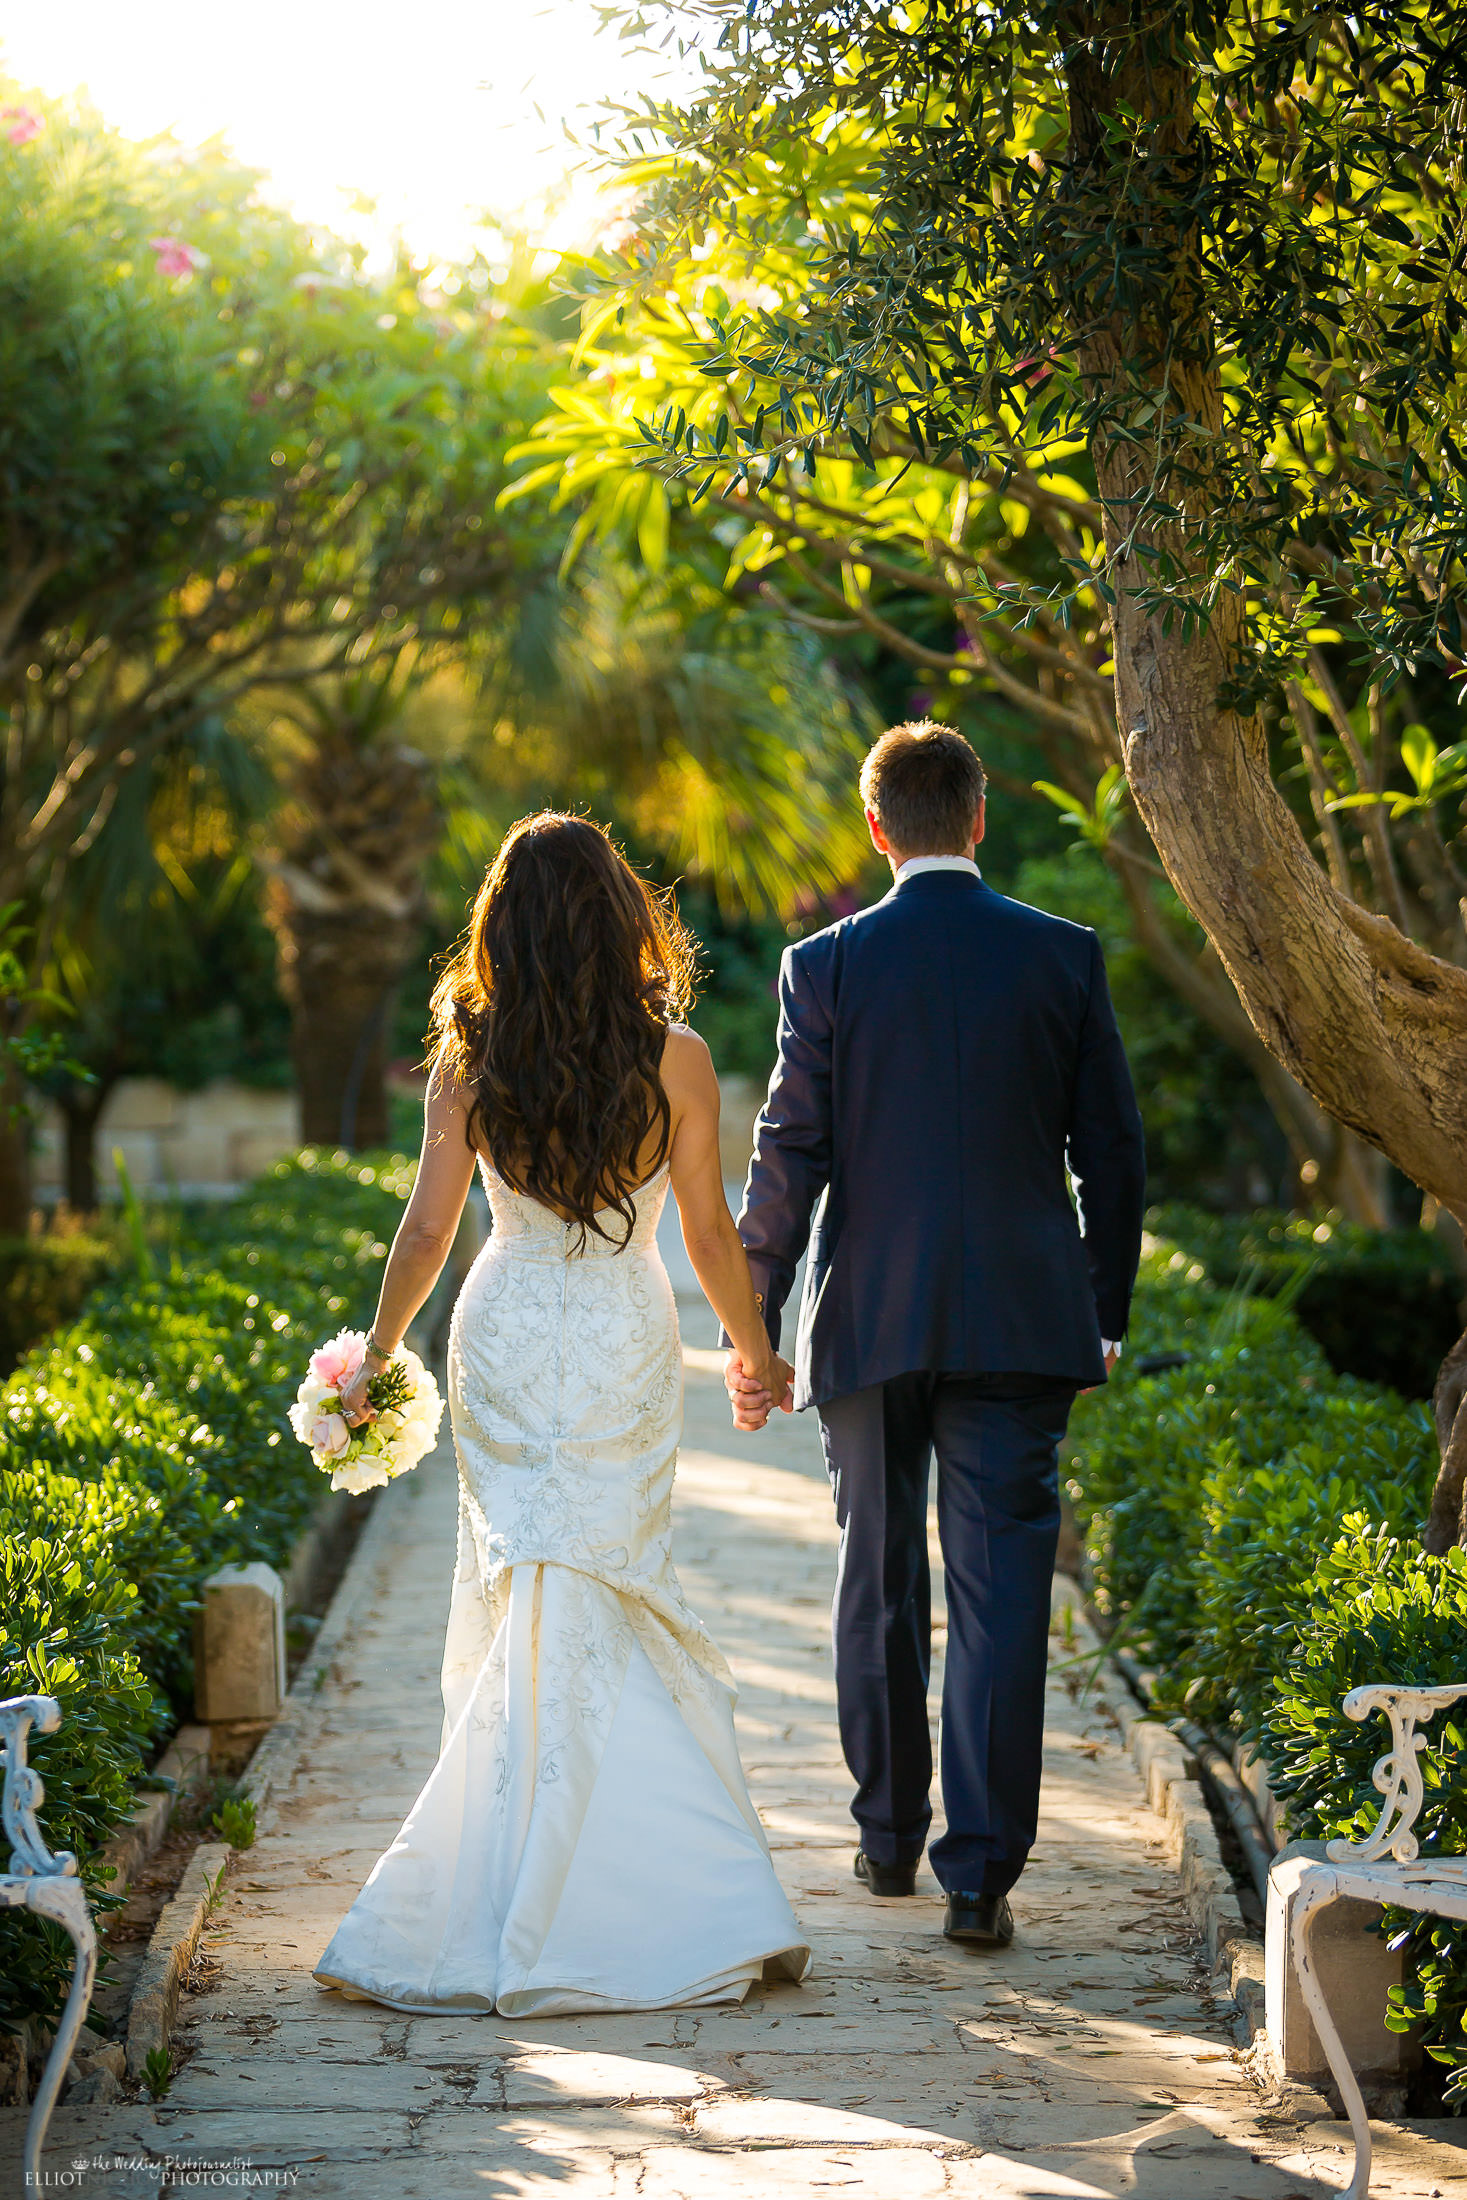 Bride and groom walk off together in the gardens of their wedding venue. Photo by Elliot NIchol Photography. www.elliotnicholphoto.com